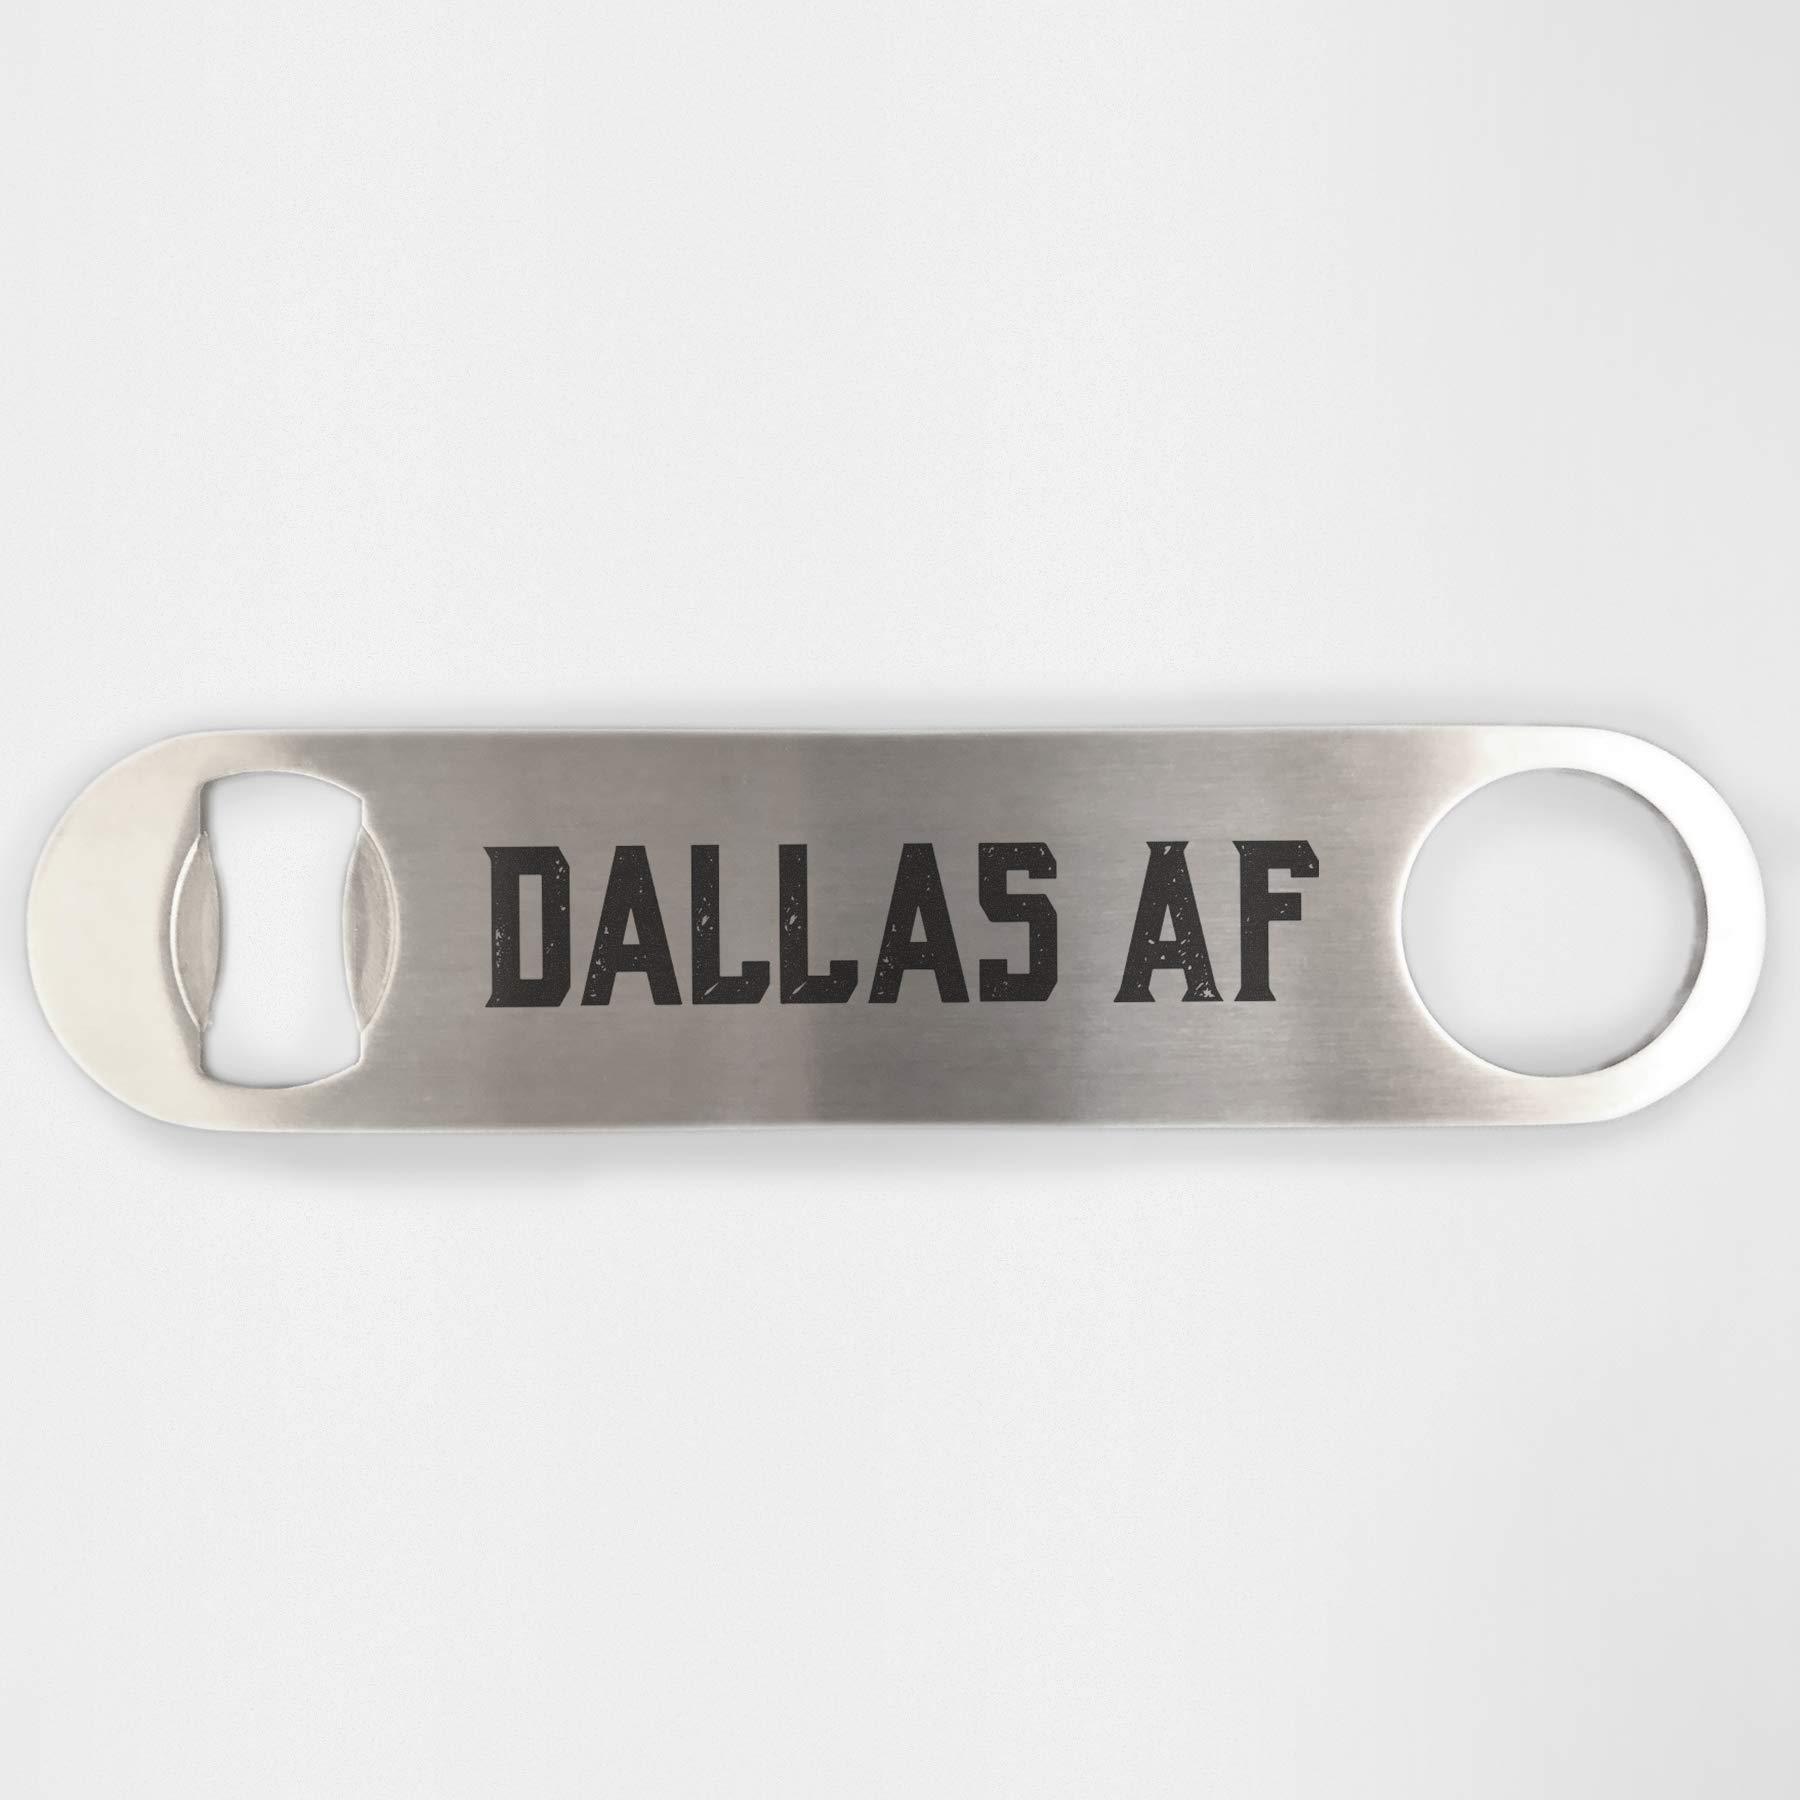 Dallas Texas Af Stainless Steel Heavy Duty Flat Bar Key Beer Laser Etched Bottle Opener